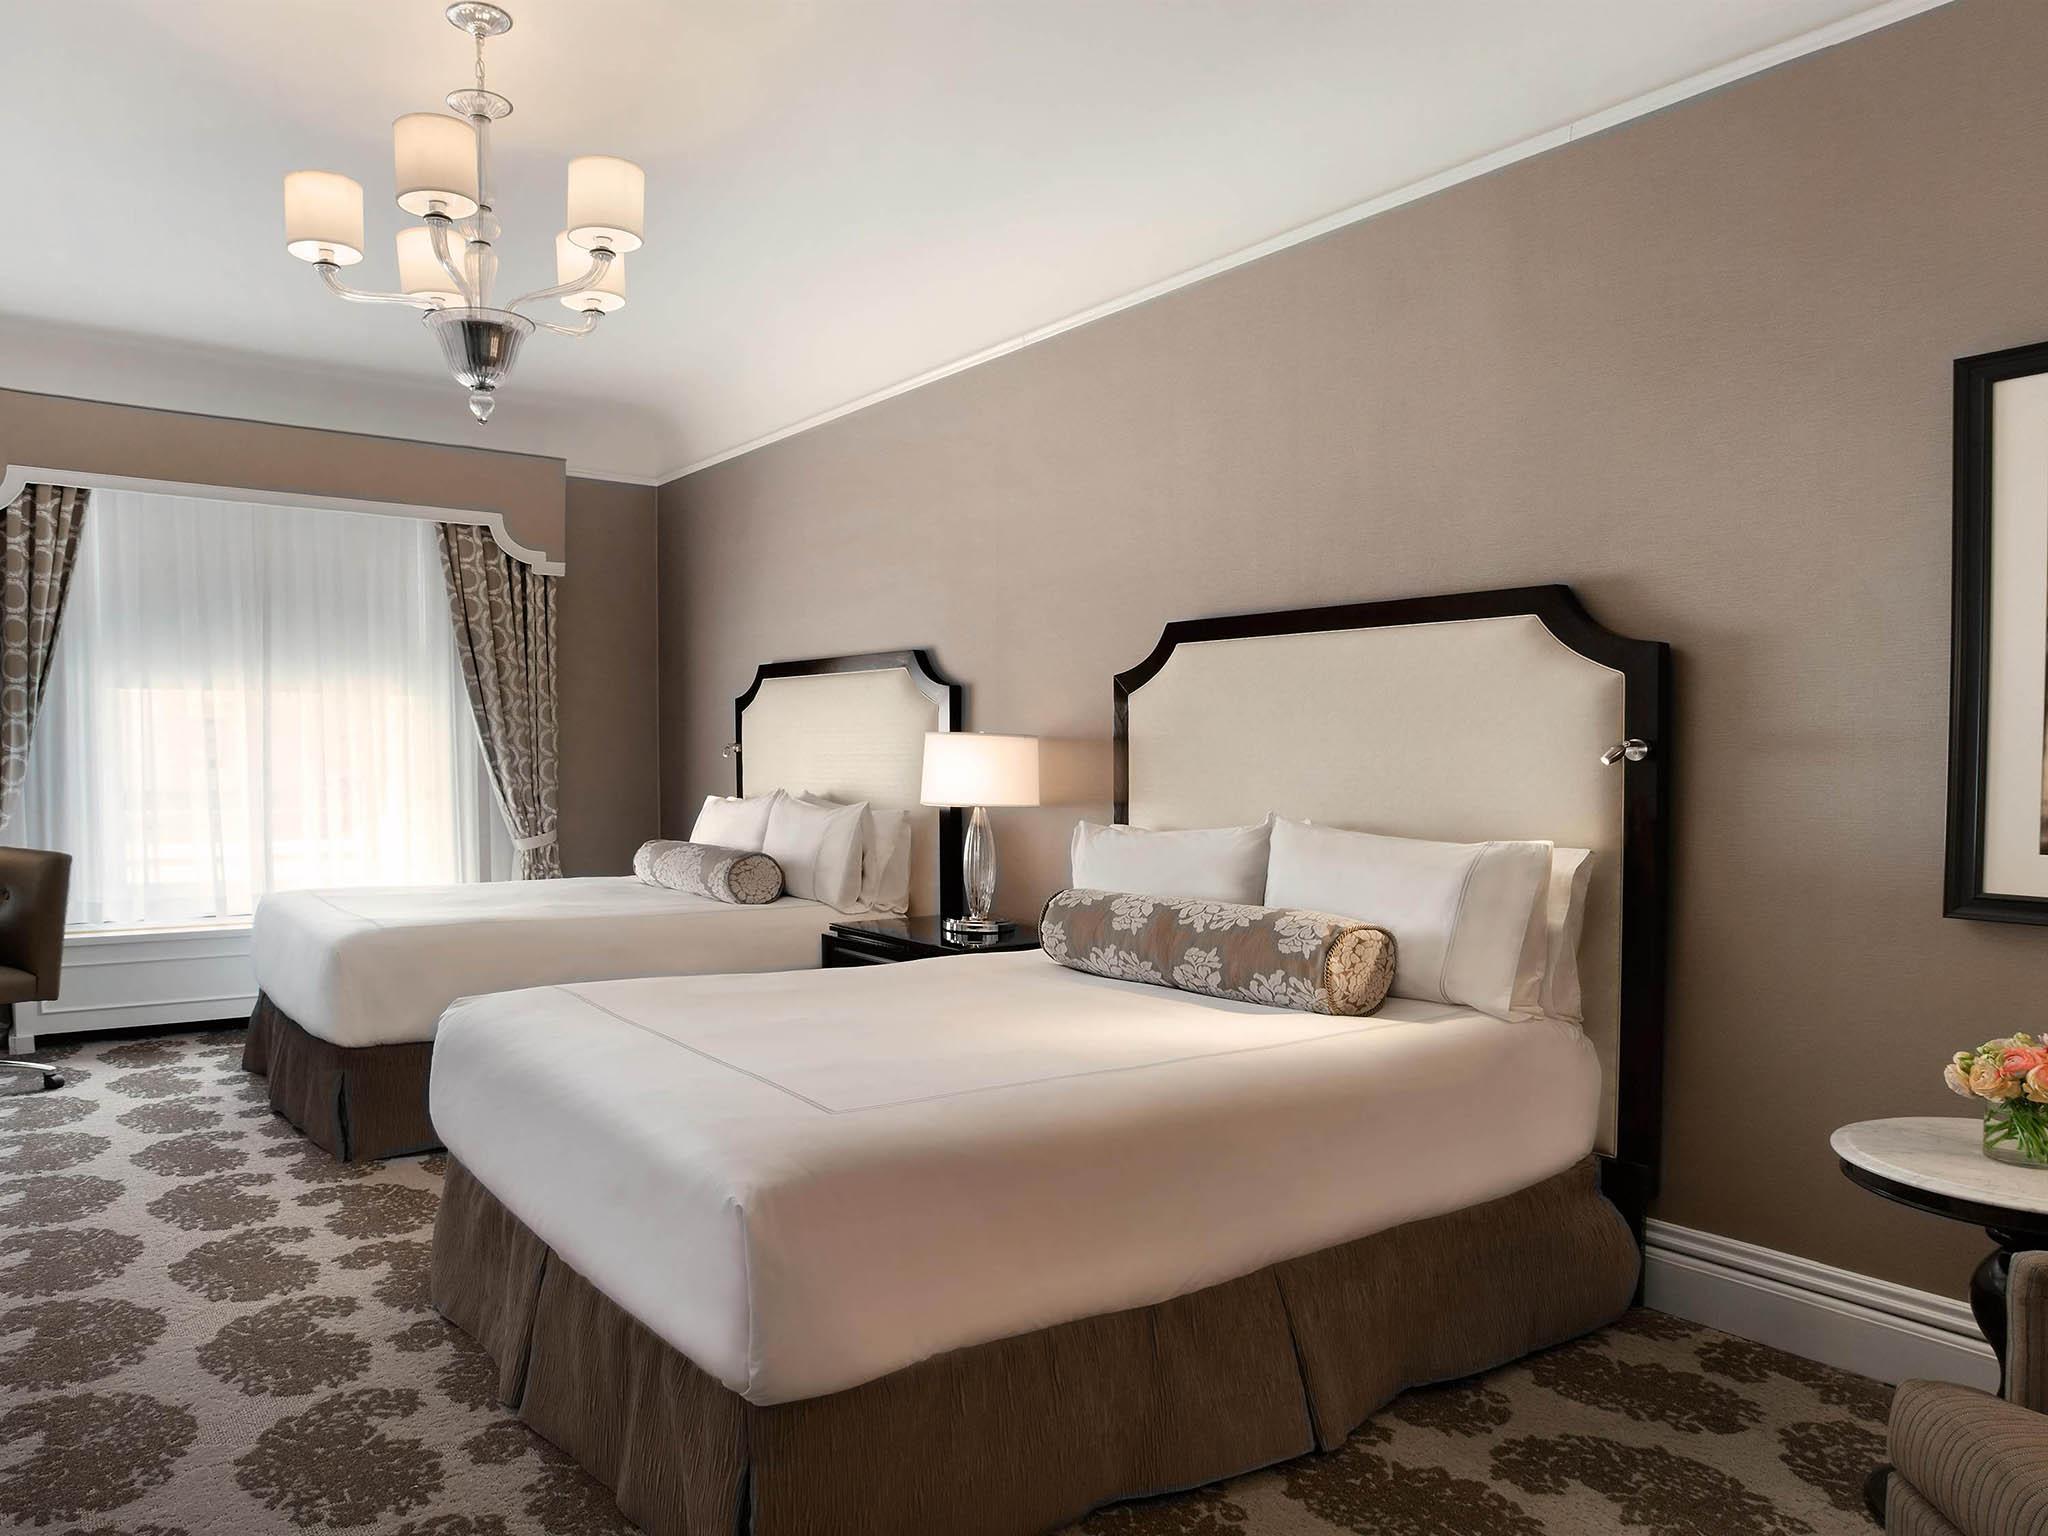 Hotel in SAN FRANCISCO - Fairmont San Francisco